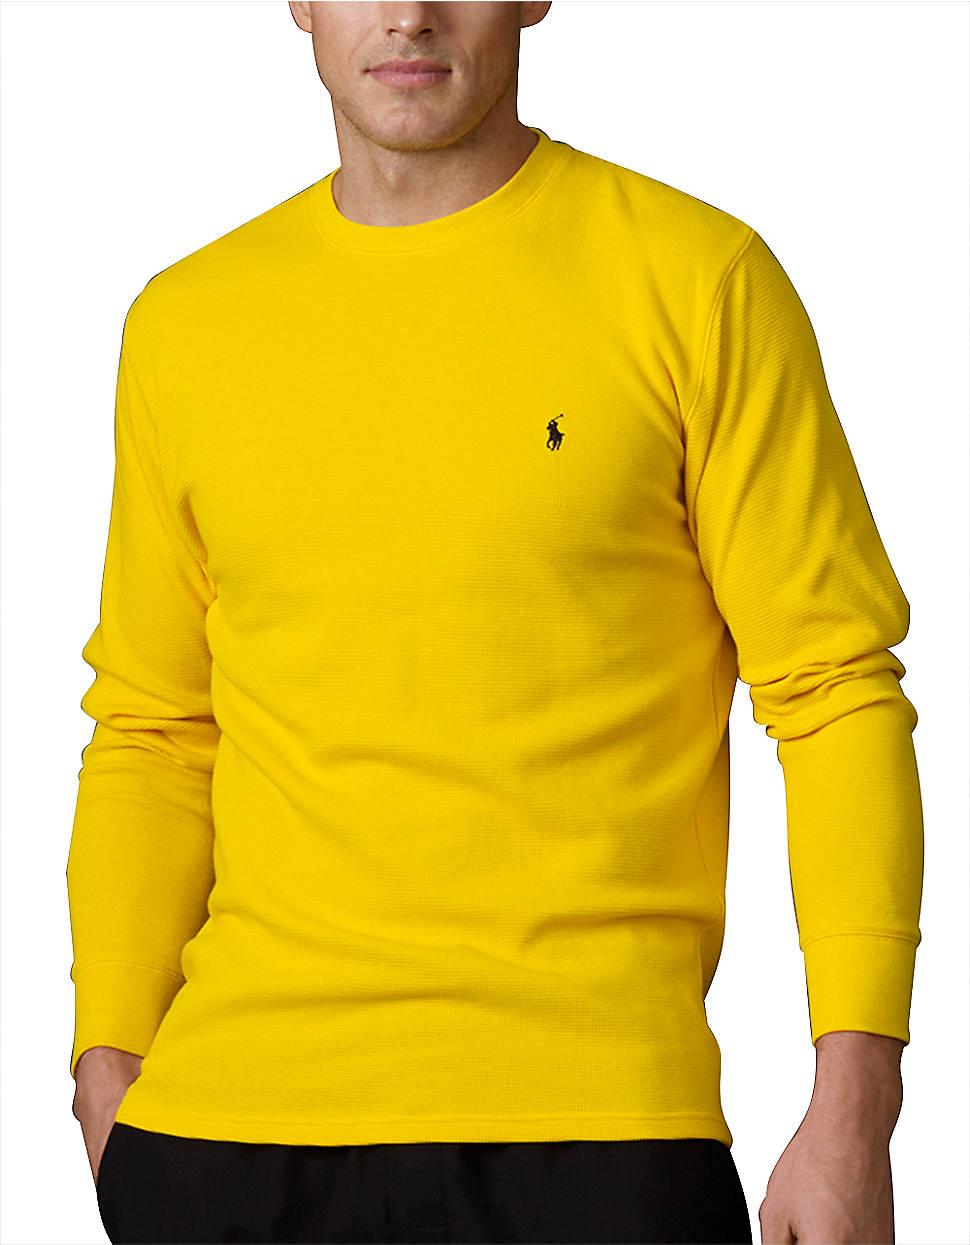 Mens Long Sleeve Nike T Shirts